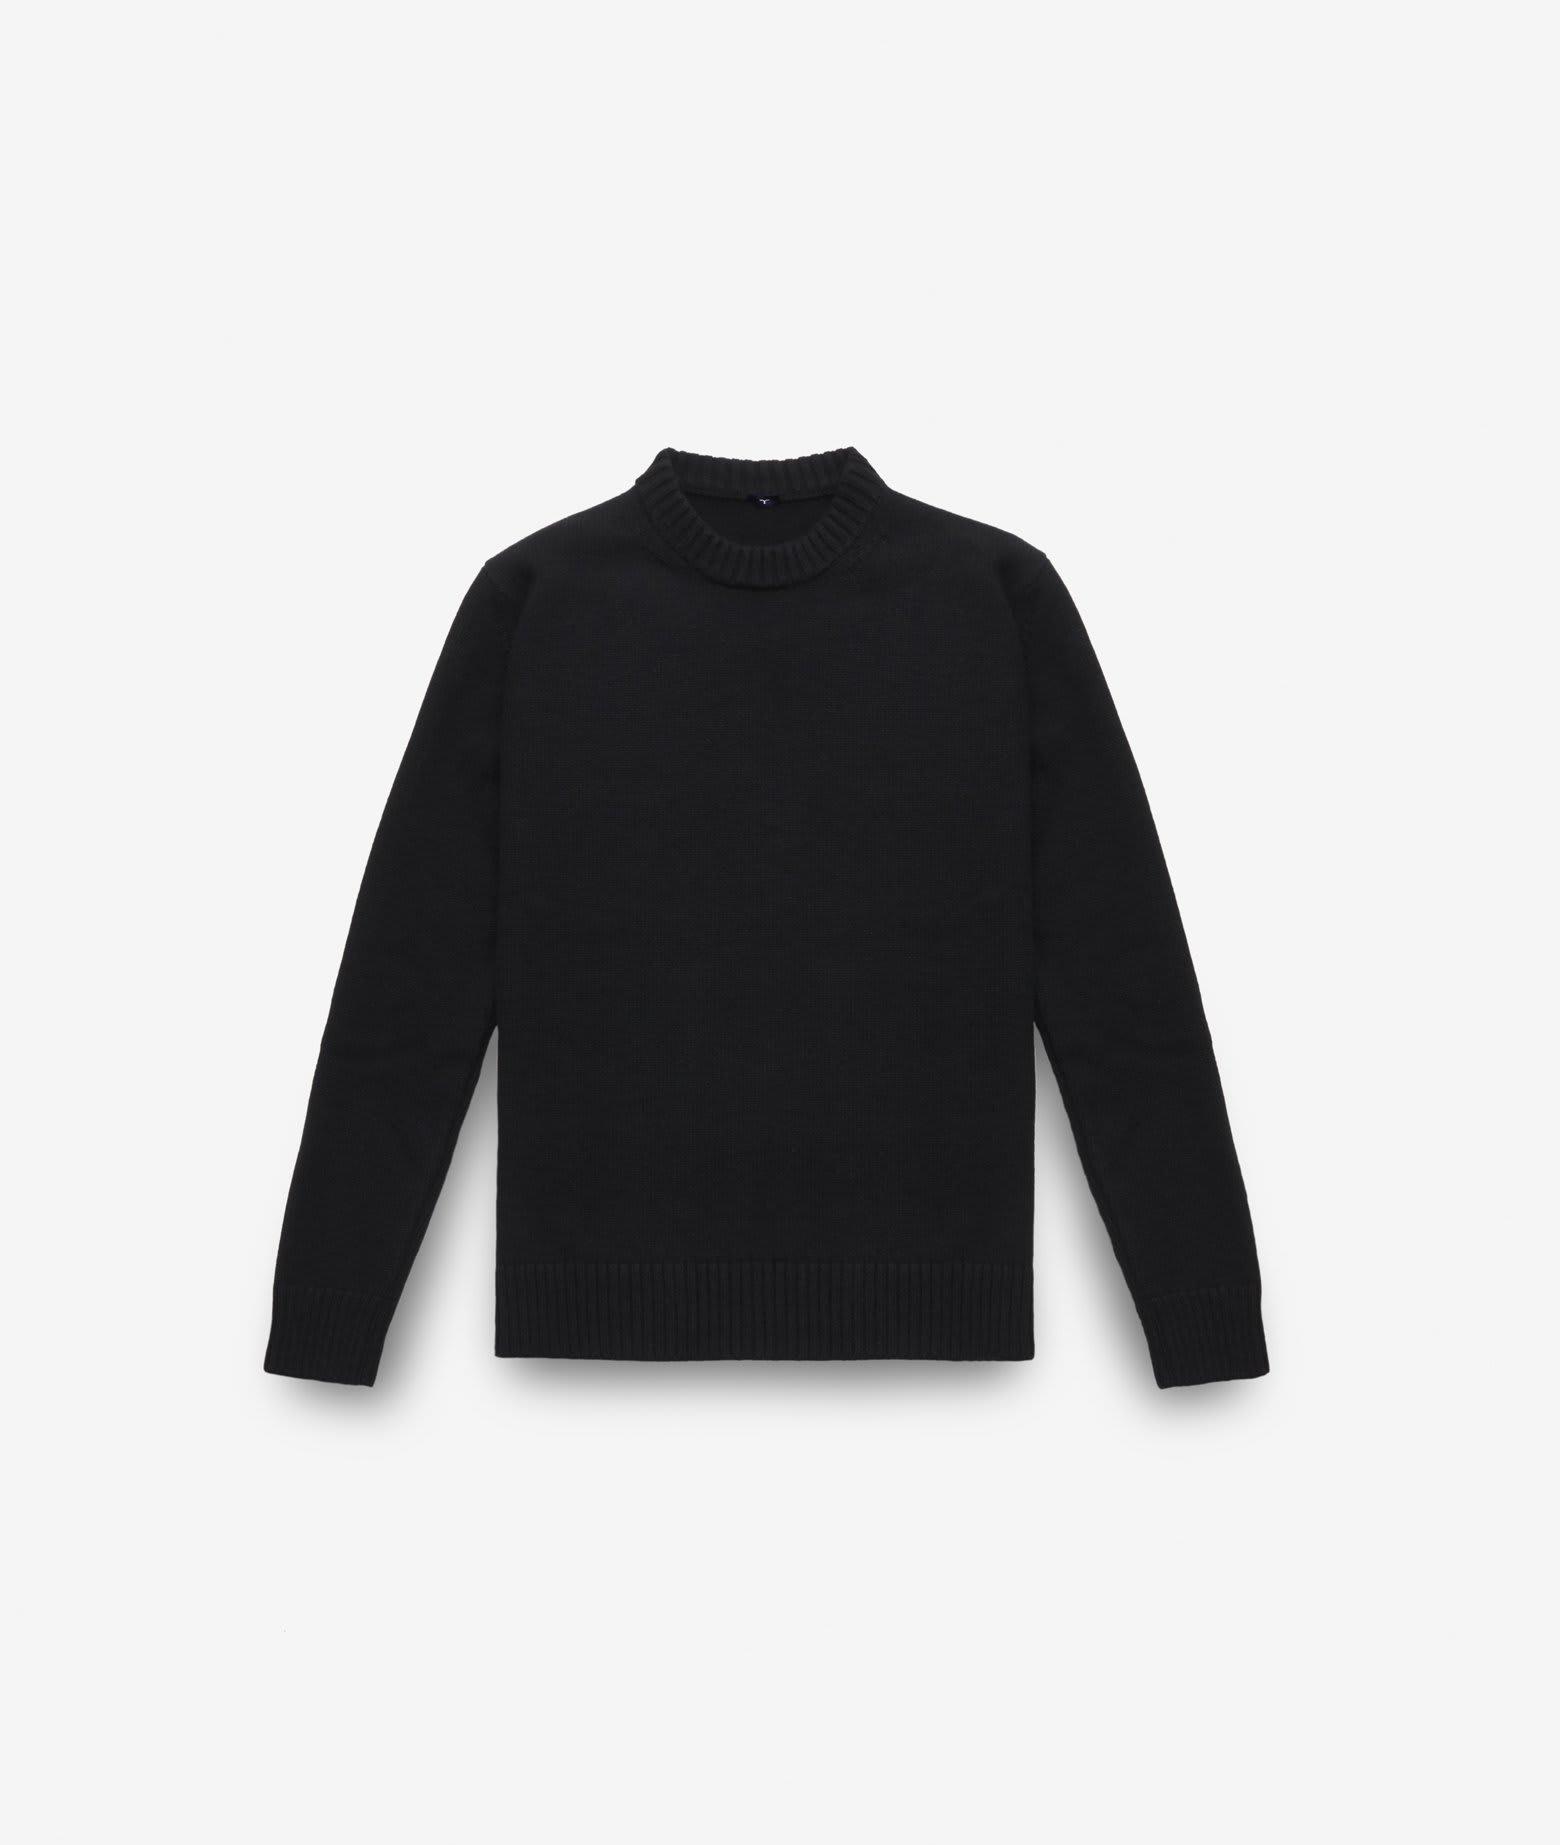 Cashmere Crew Neck Sweater diablerets